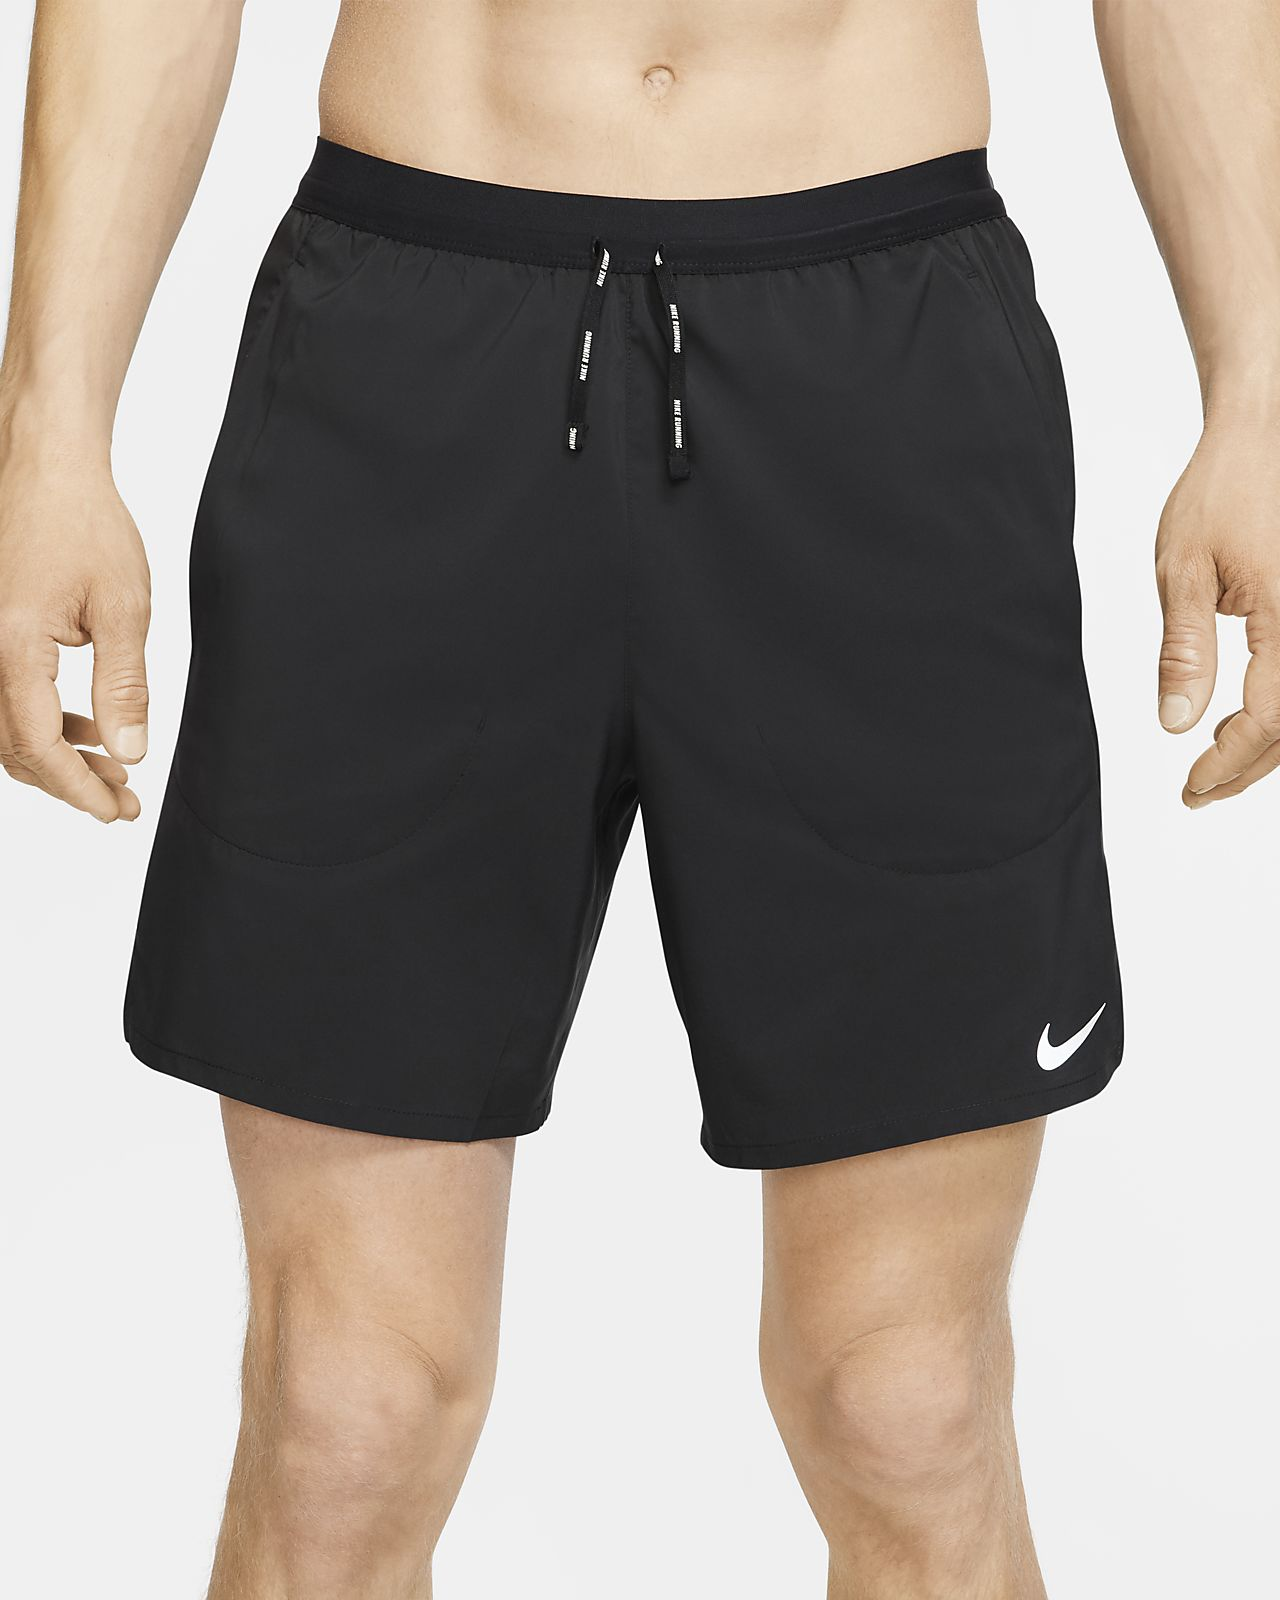 Nike Flex Stride Men's 18cm (approx.) 2 in 1 Running Shorts